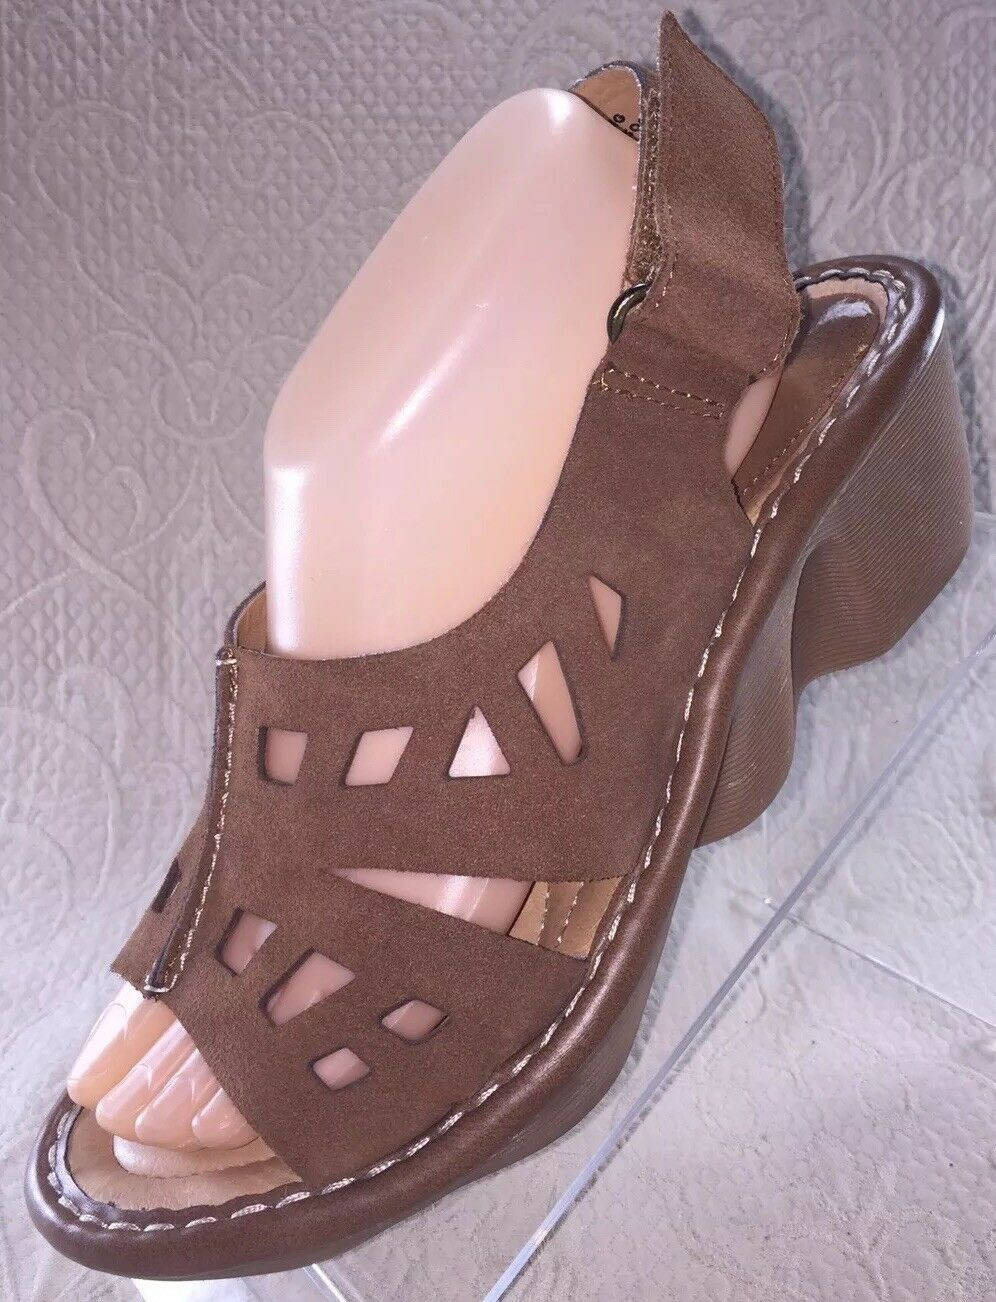 EARTH Stargaze Light Sand Suede Wedge Sandal Women 10 B Tan shoes Worn Once